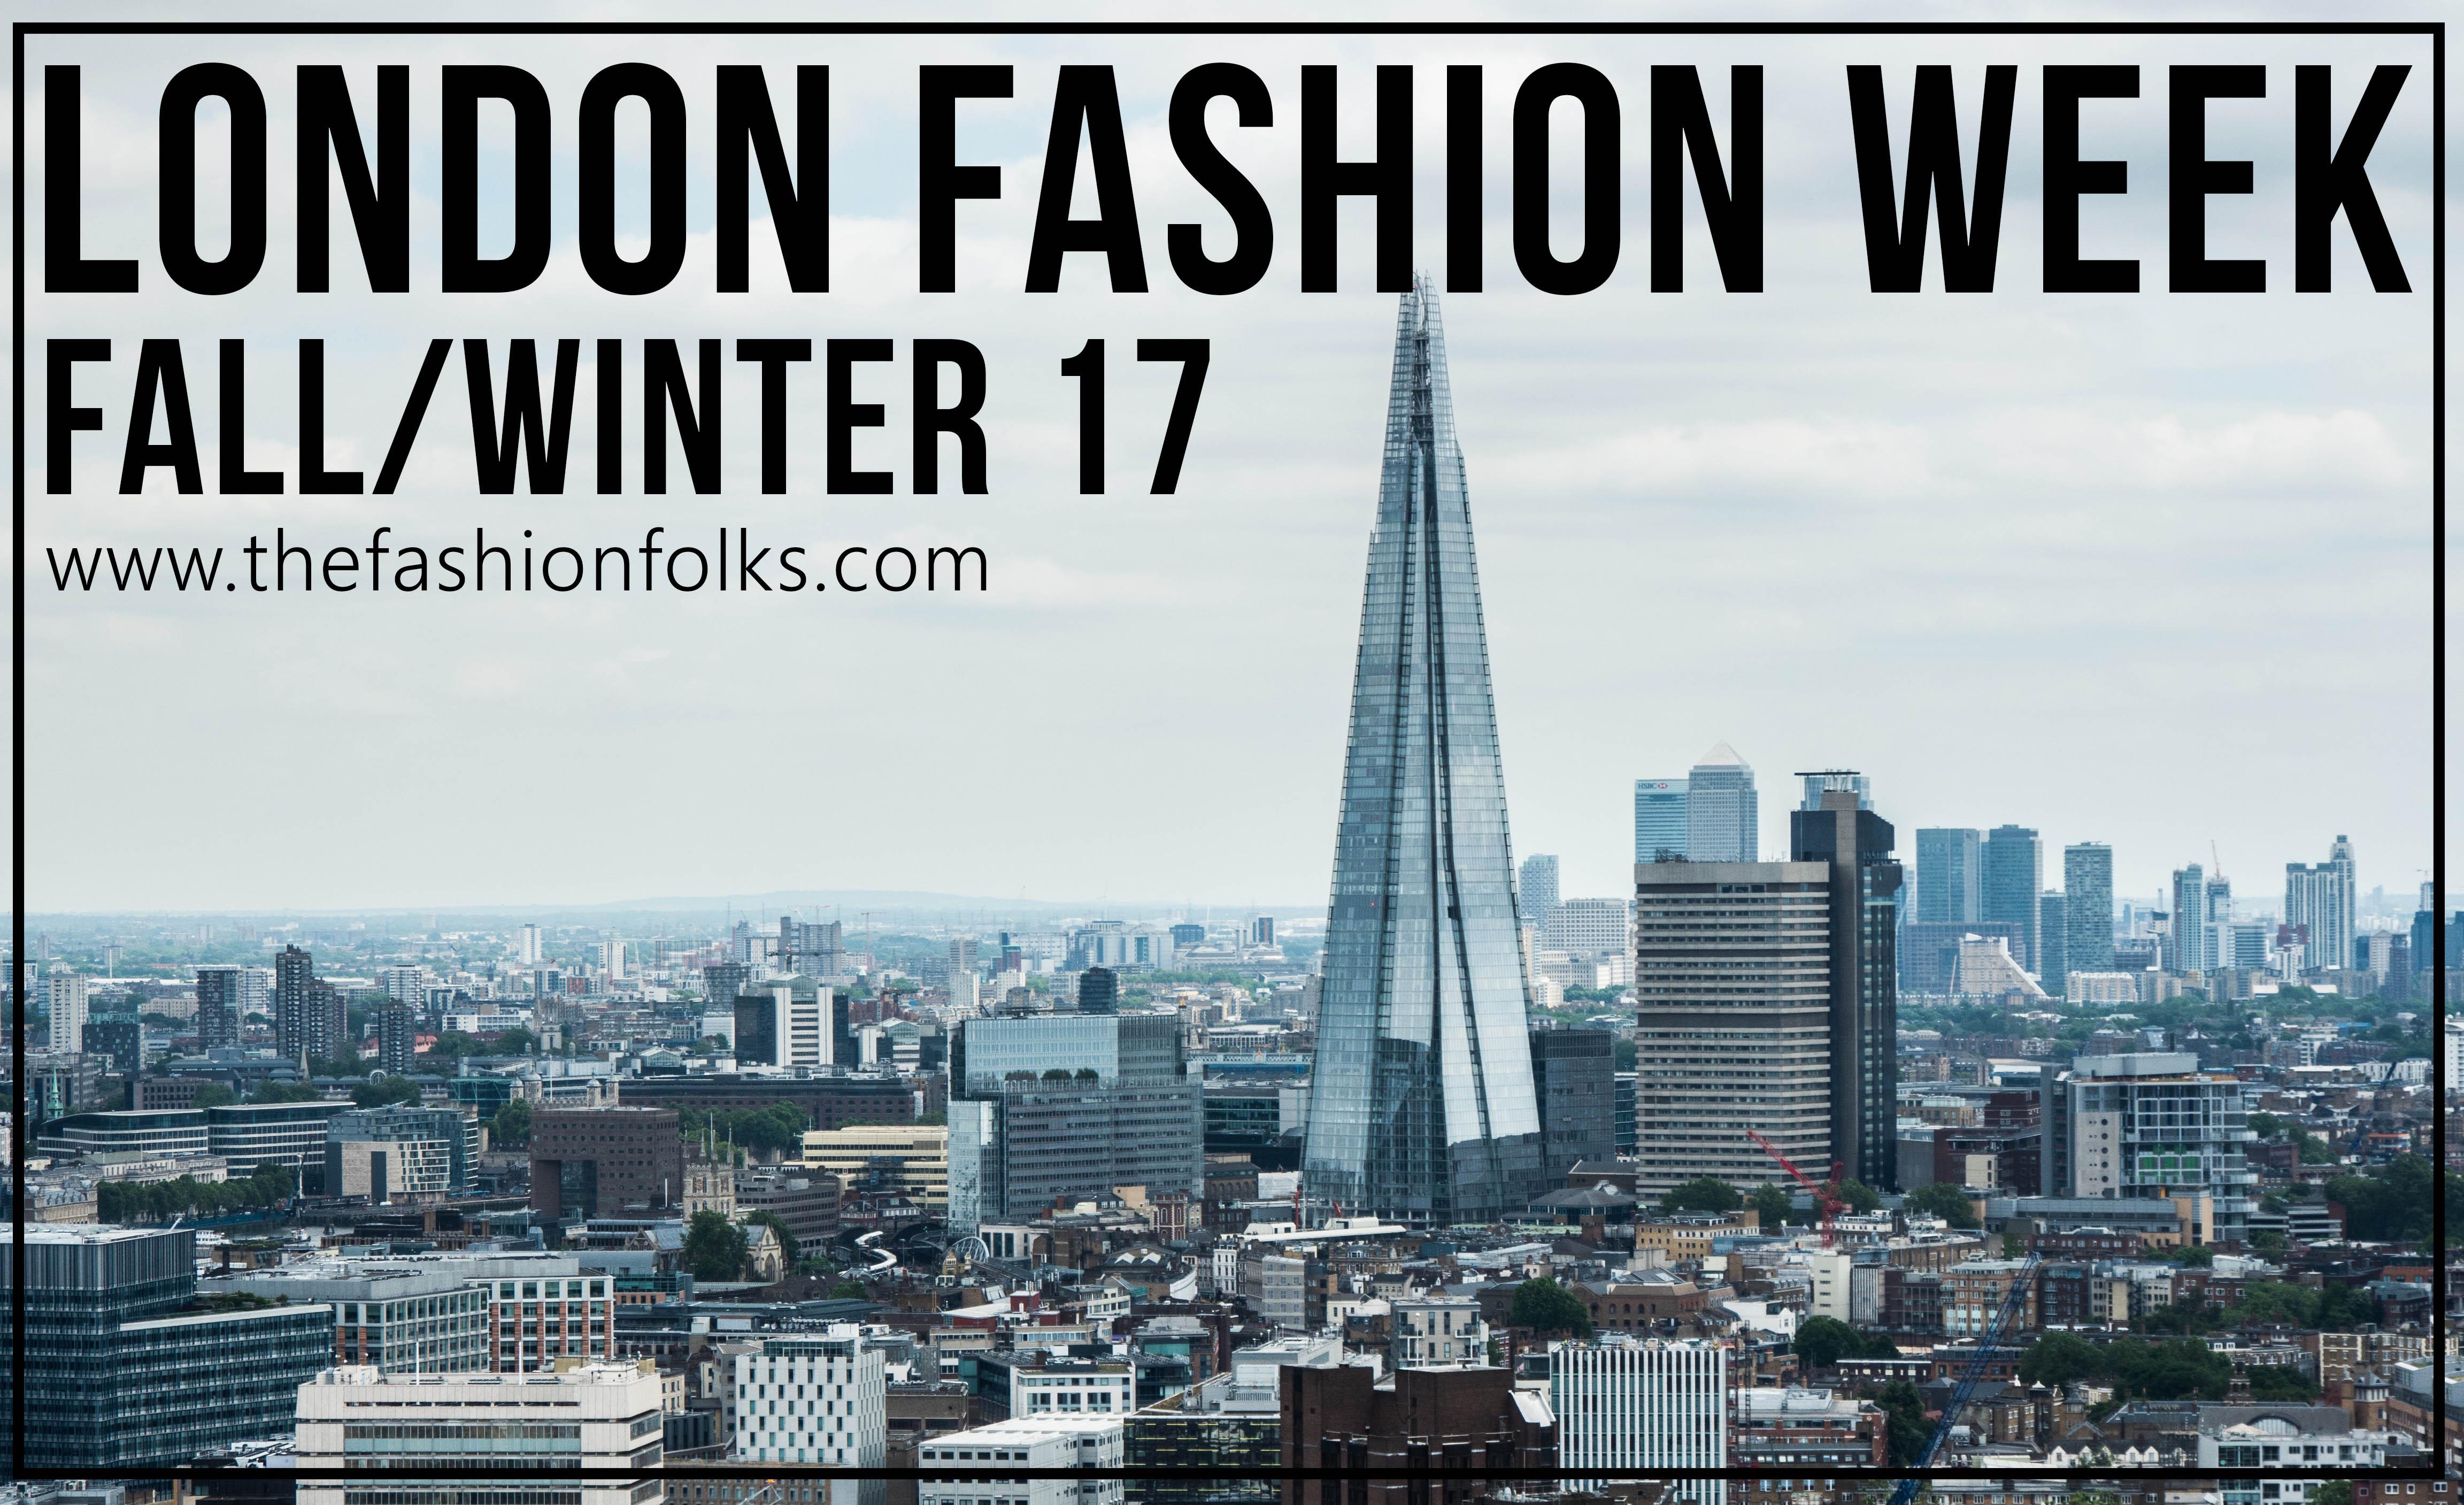 London Fashion Week Fall Winter 2017 | The Fashion Folks